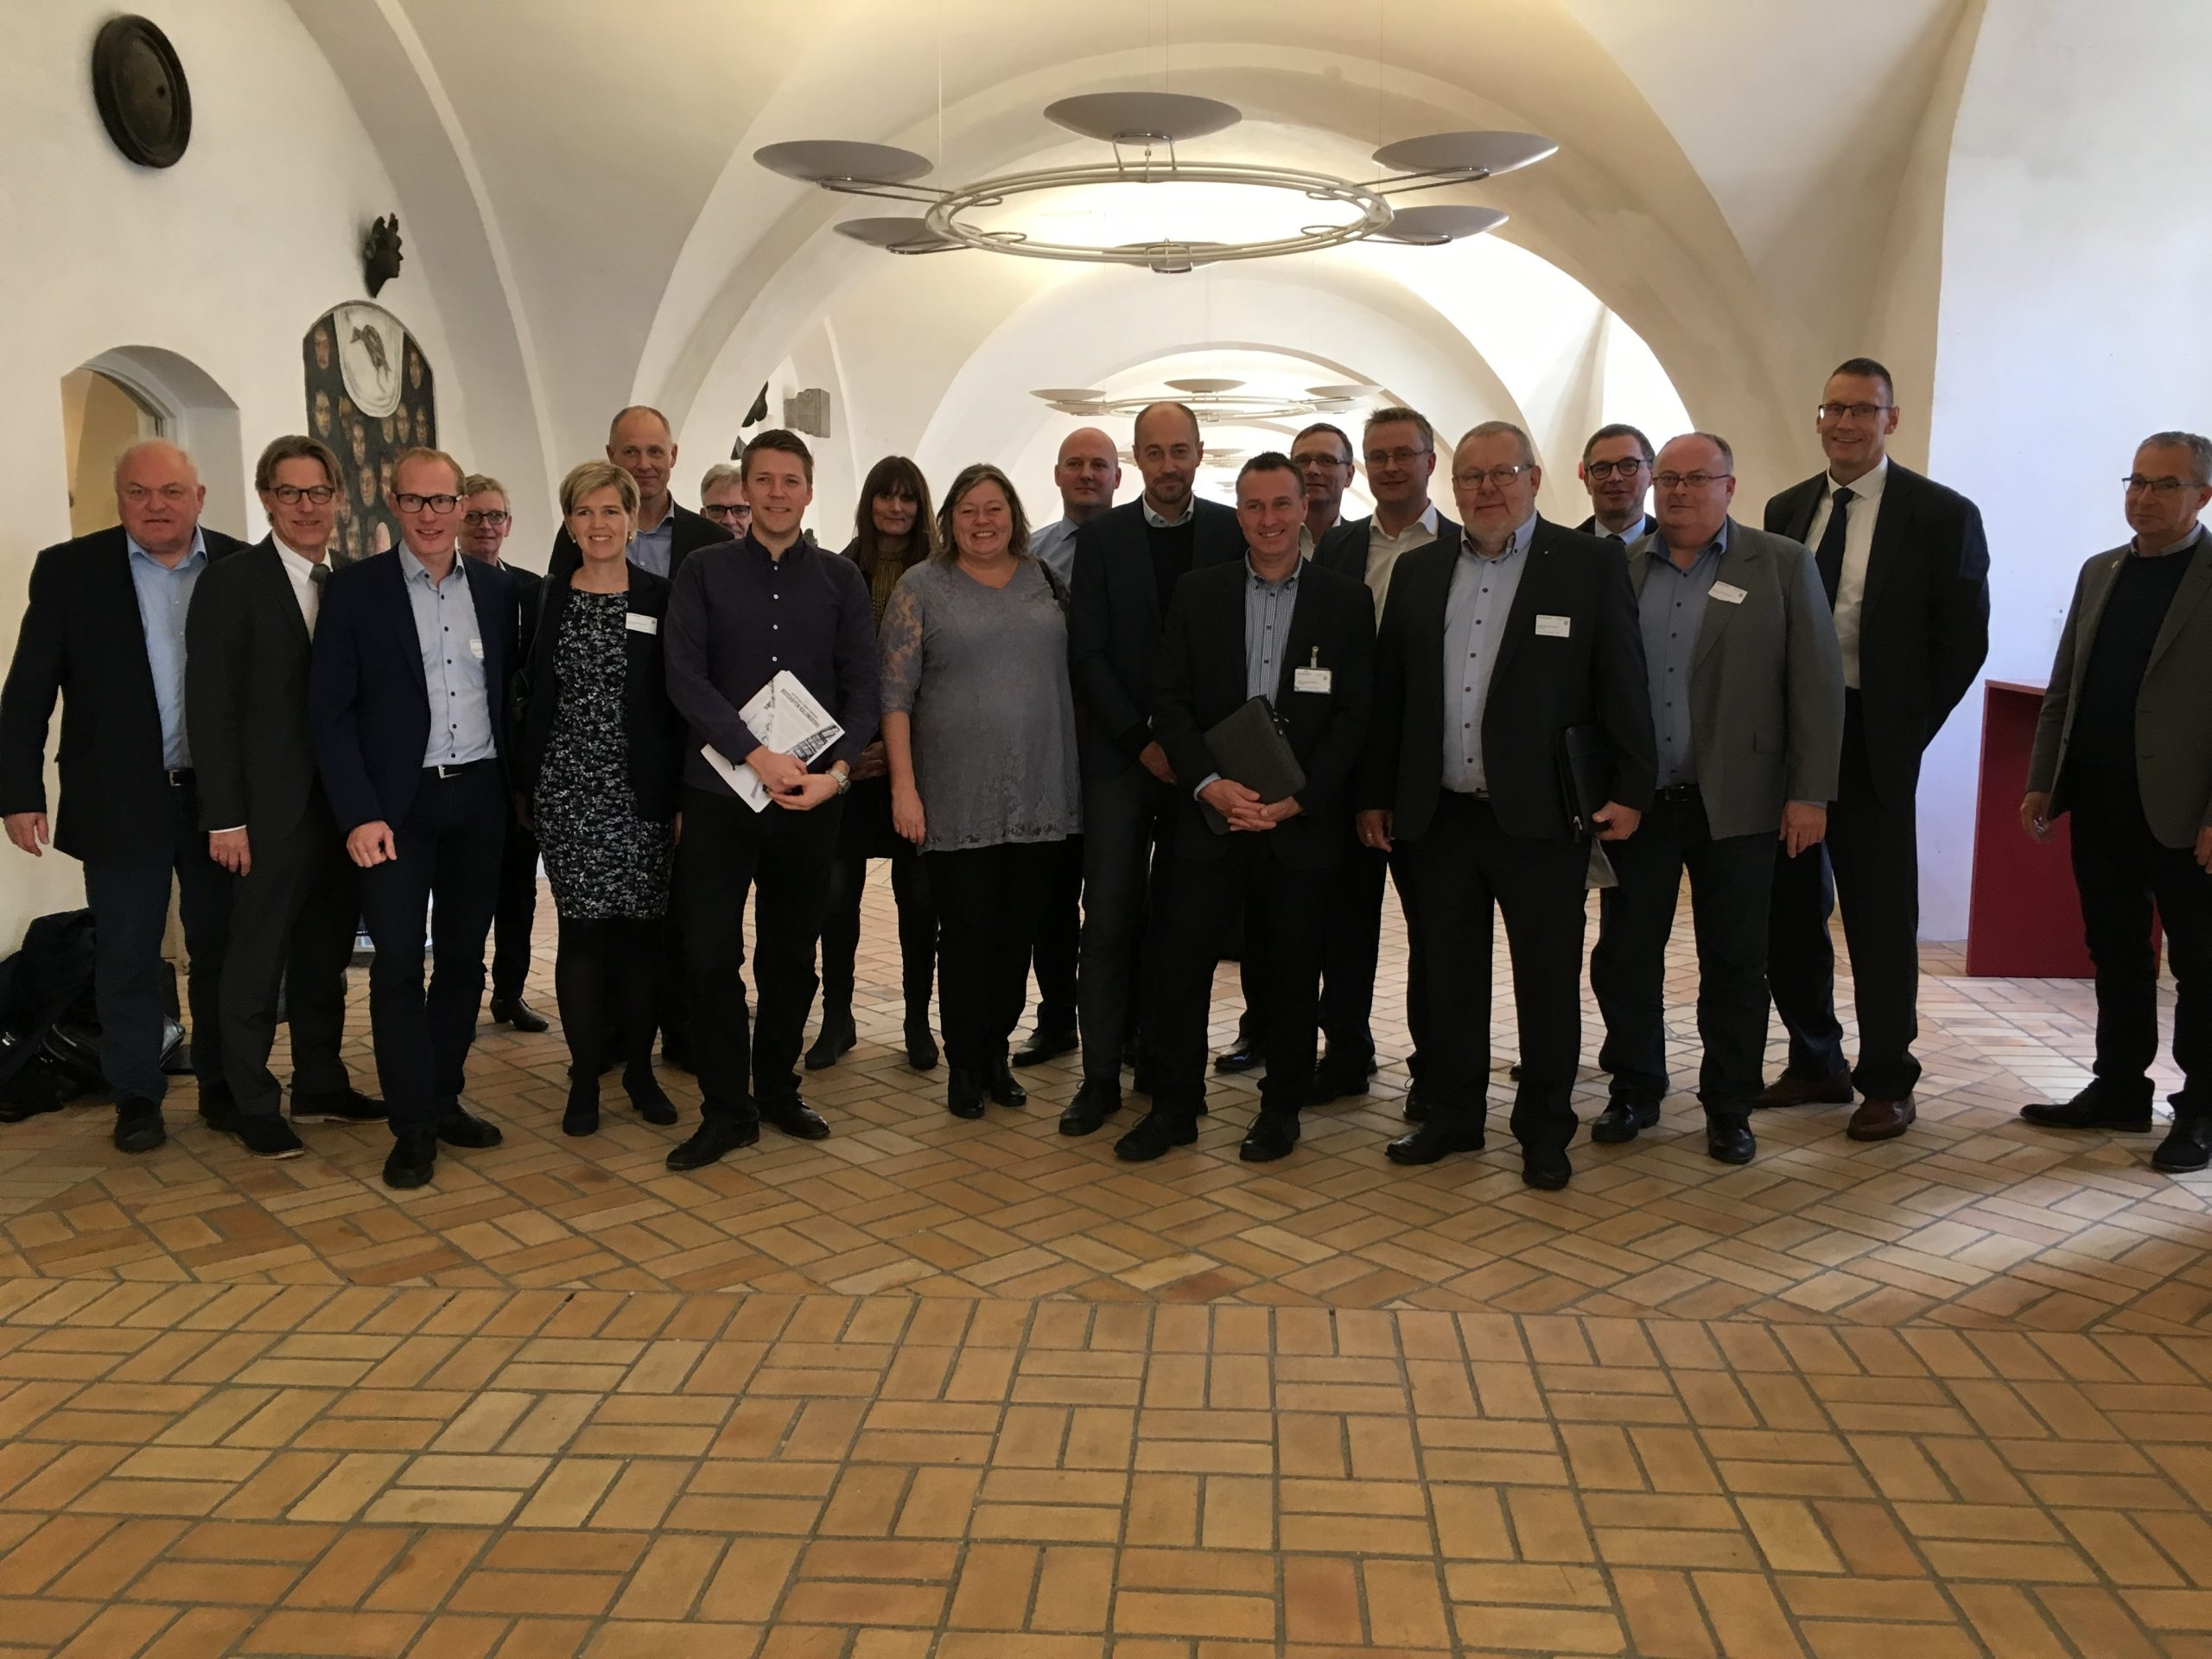 Politikere og erhvervsfolk på Christiansborg